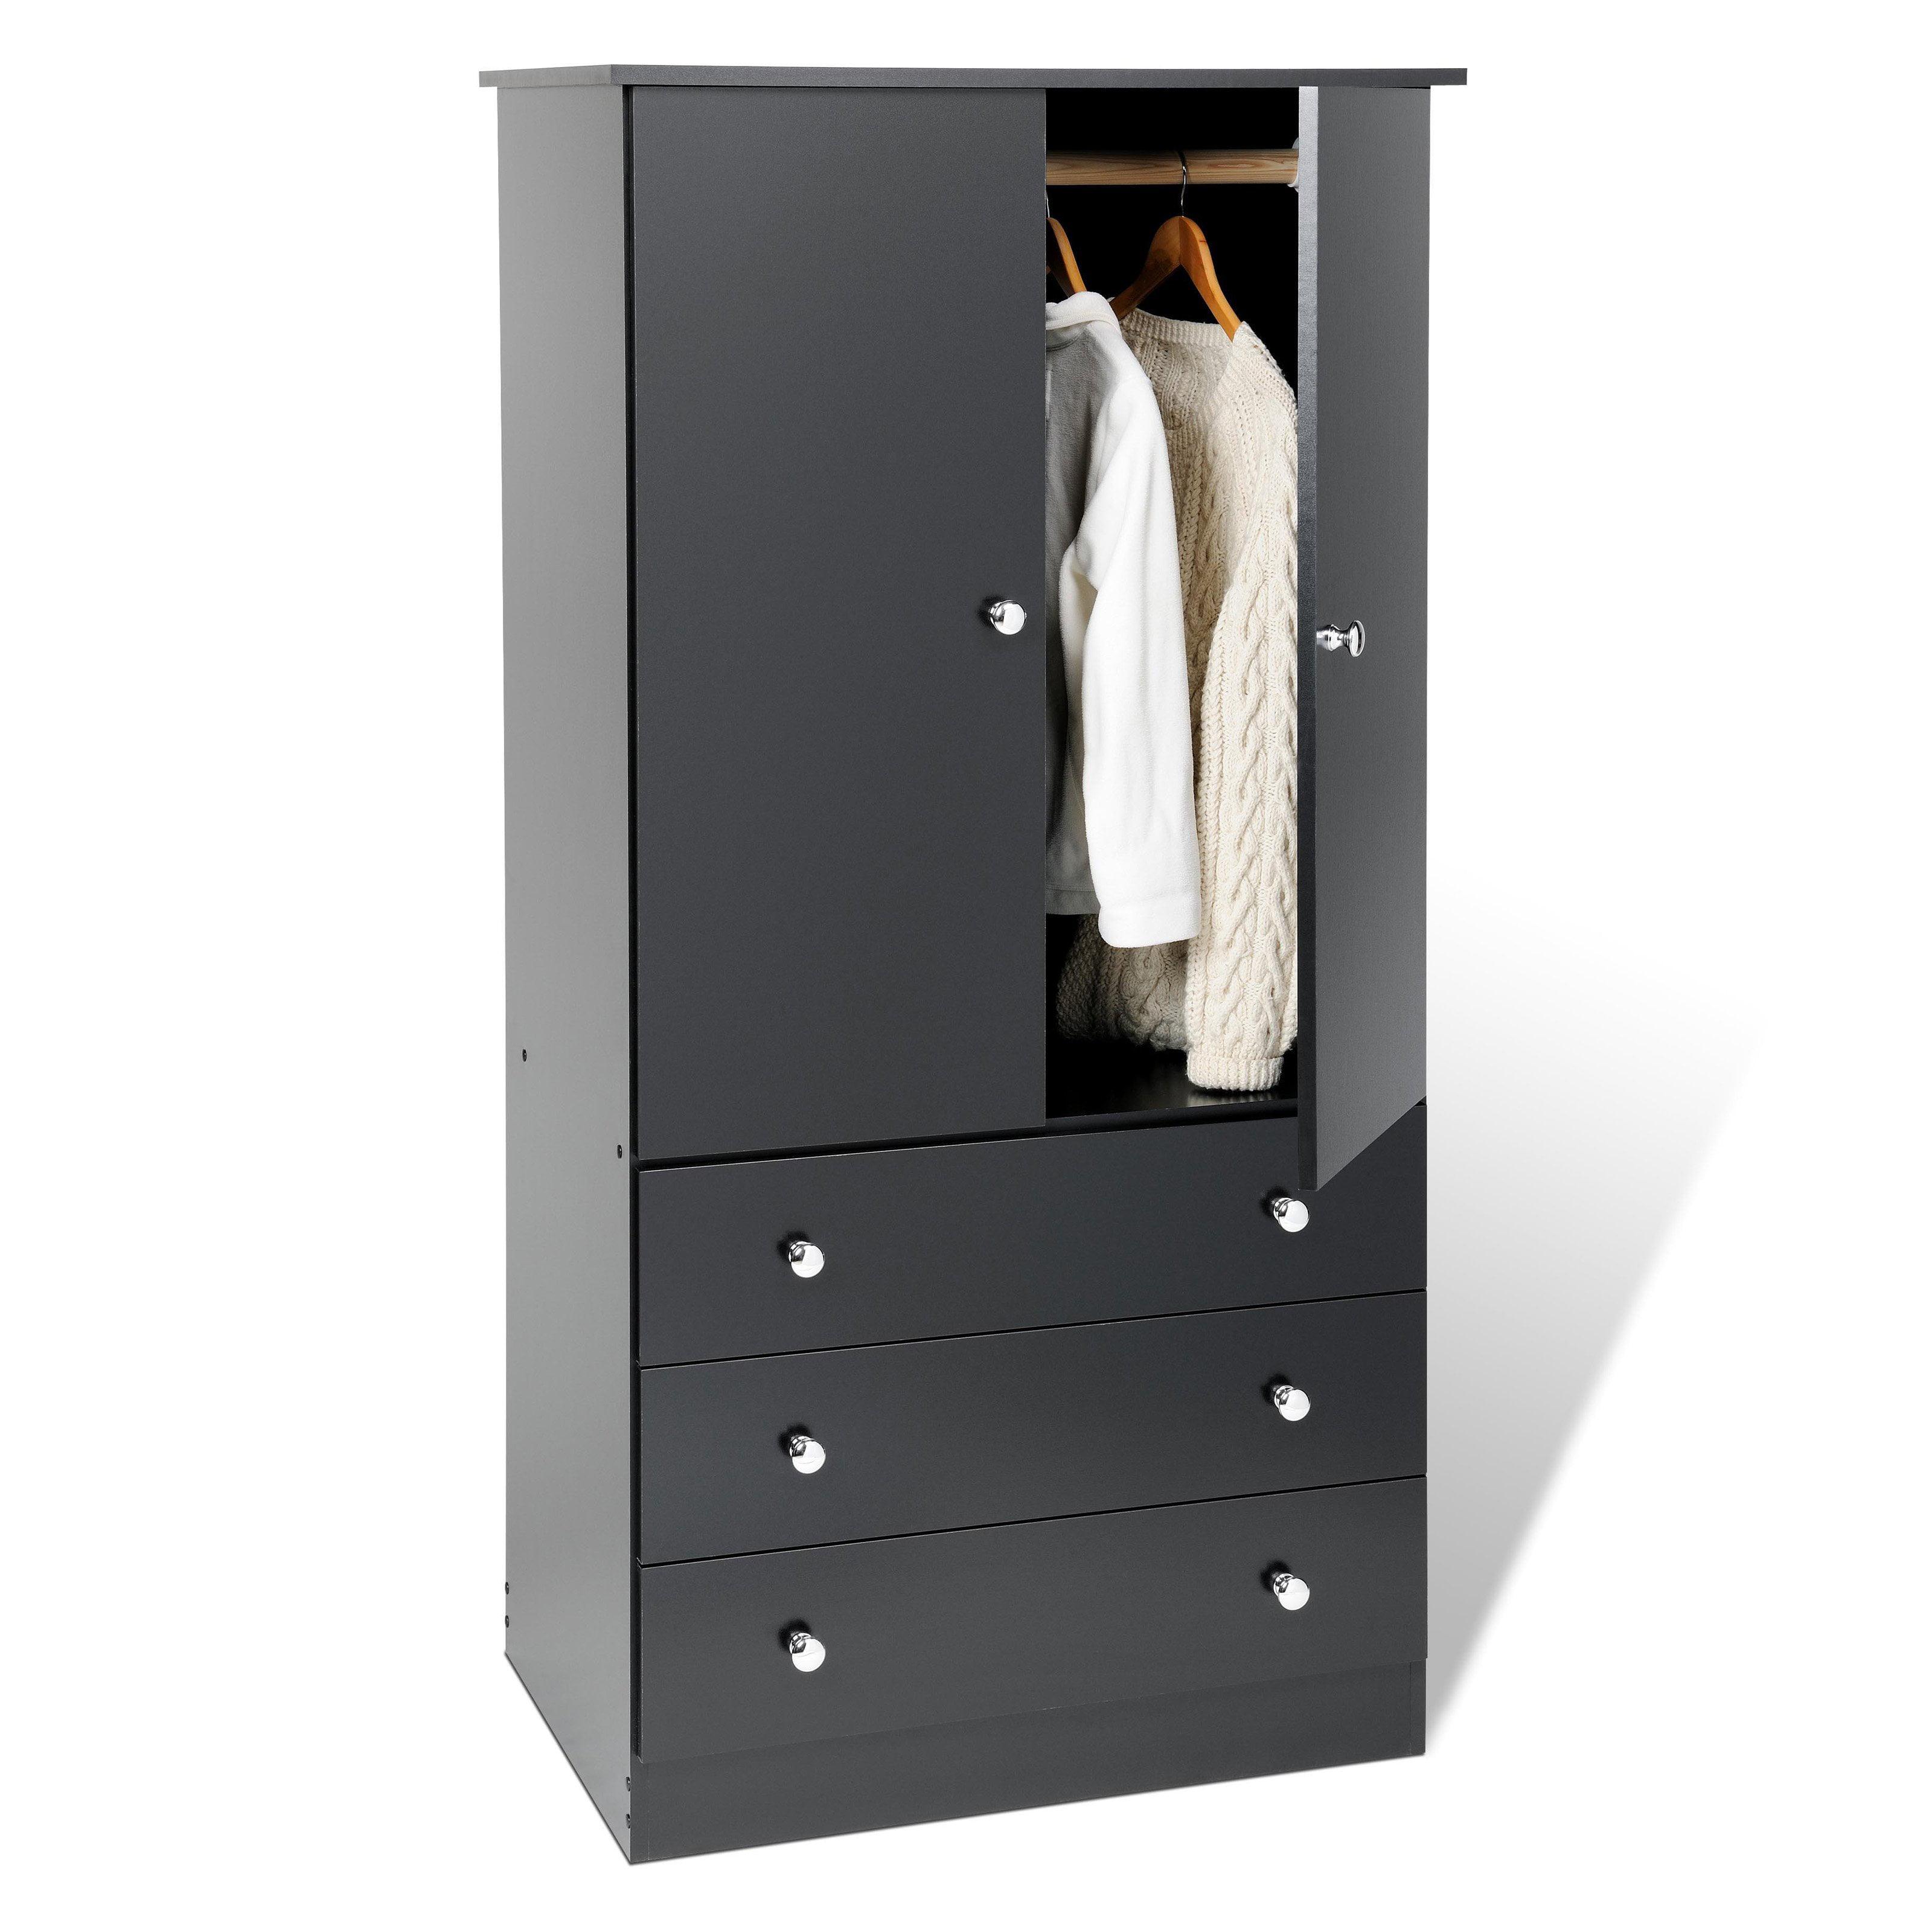 Prepac Edenvale Bedroom Wardrobe Armoire   Walmart.com